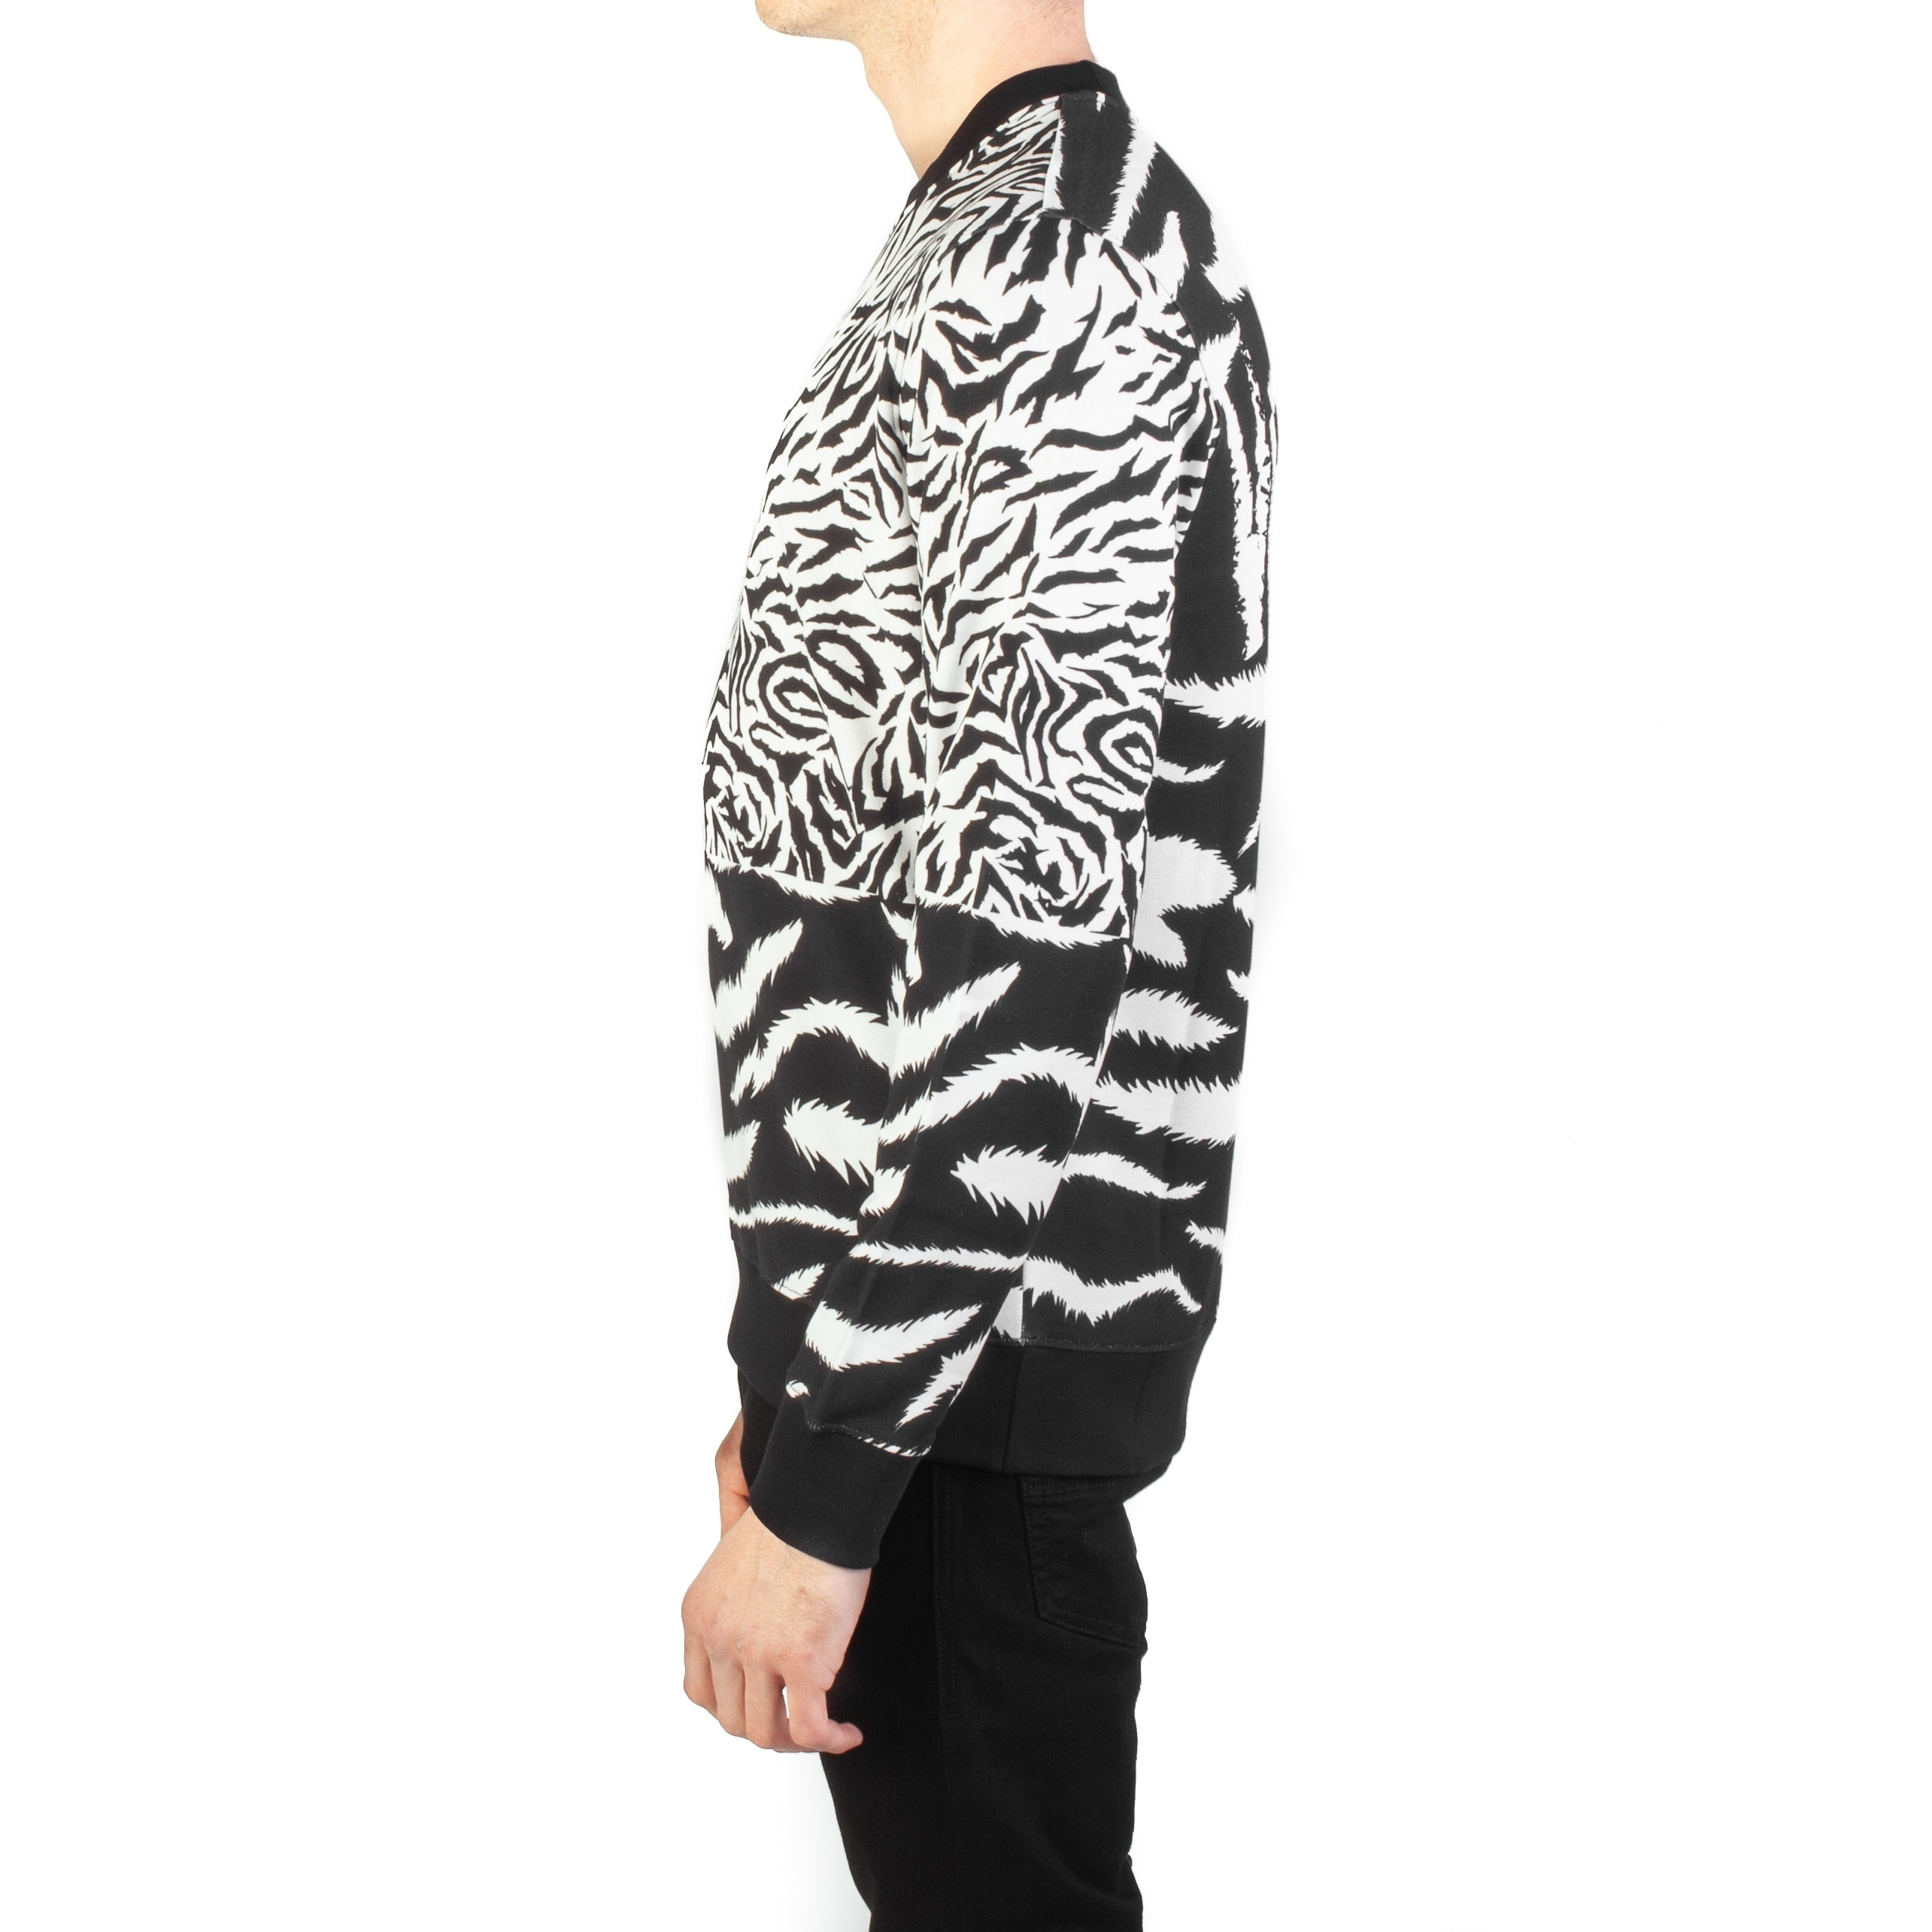 aea45b24 Versace Versus Men's Cotton Zebra Print Sweatshirt White Black